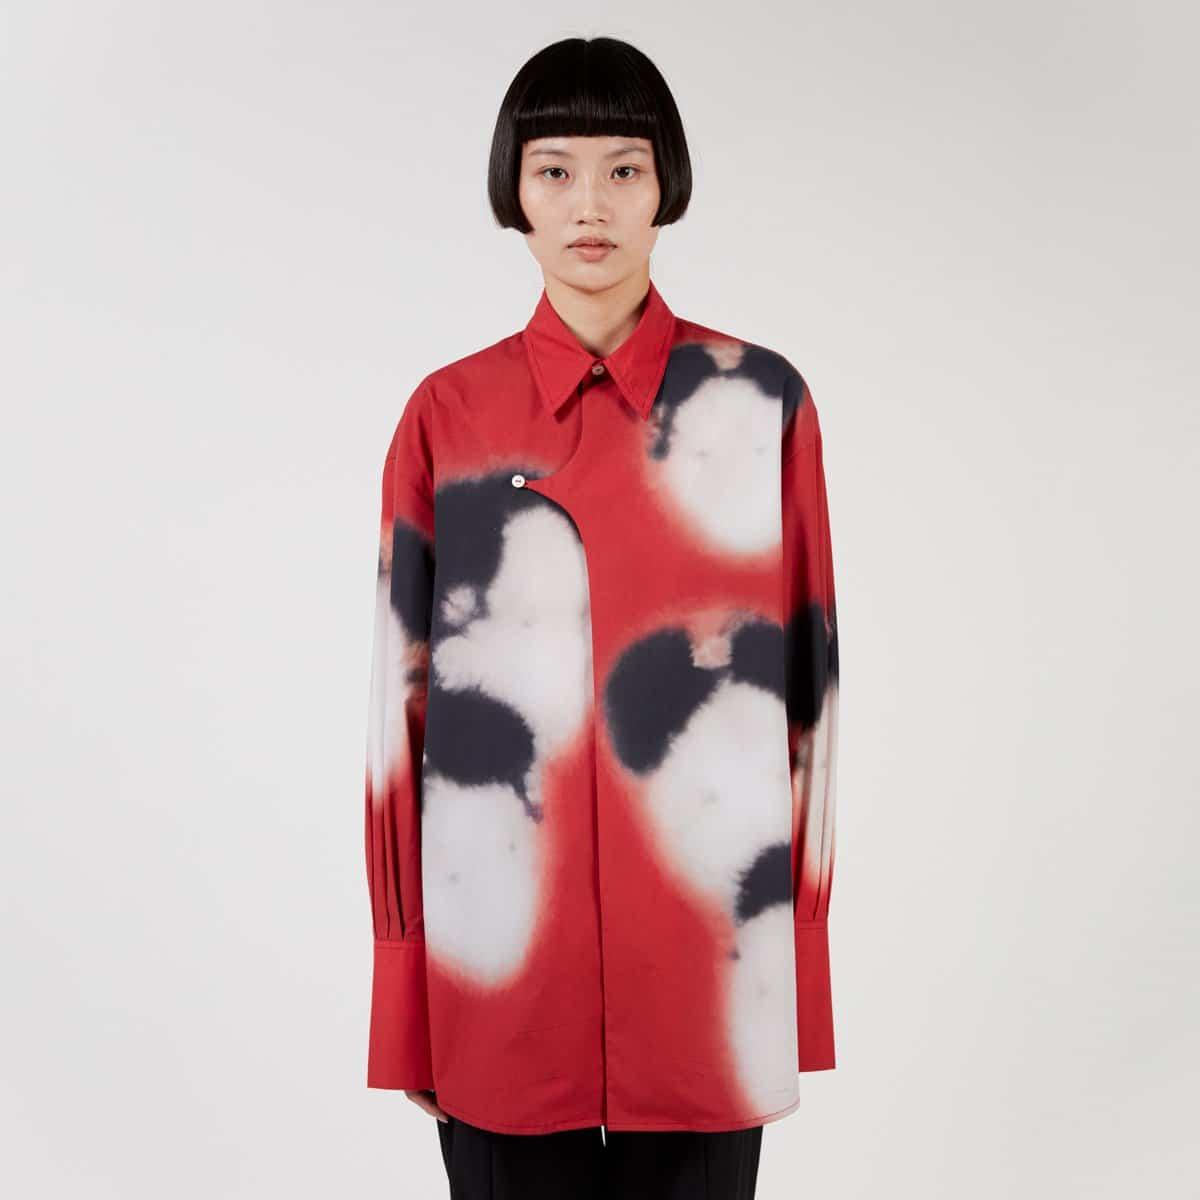 J.Kim Shirt With Faces